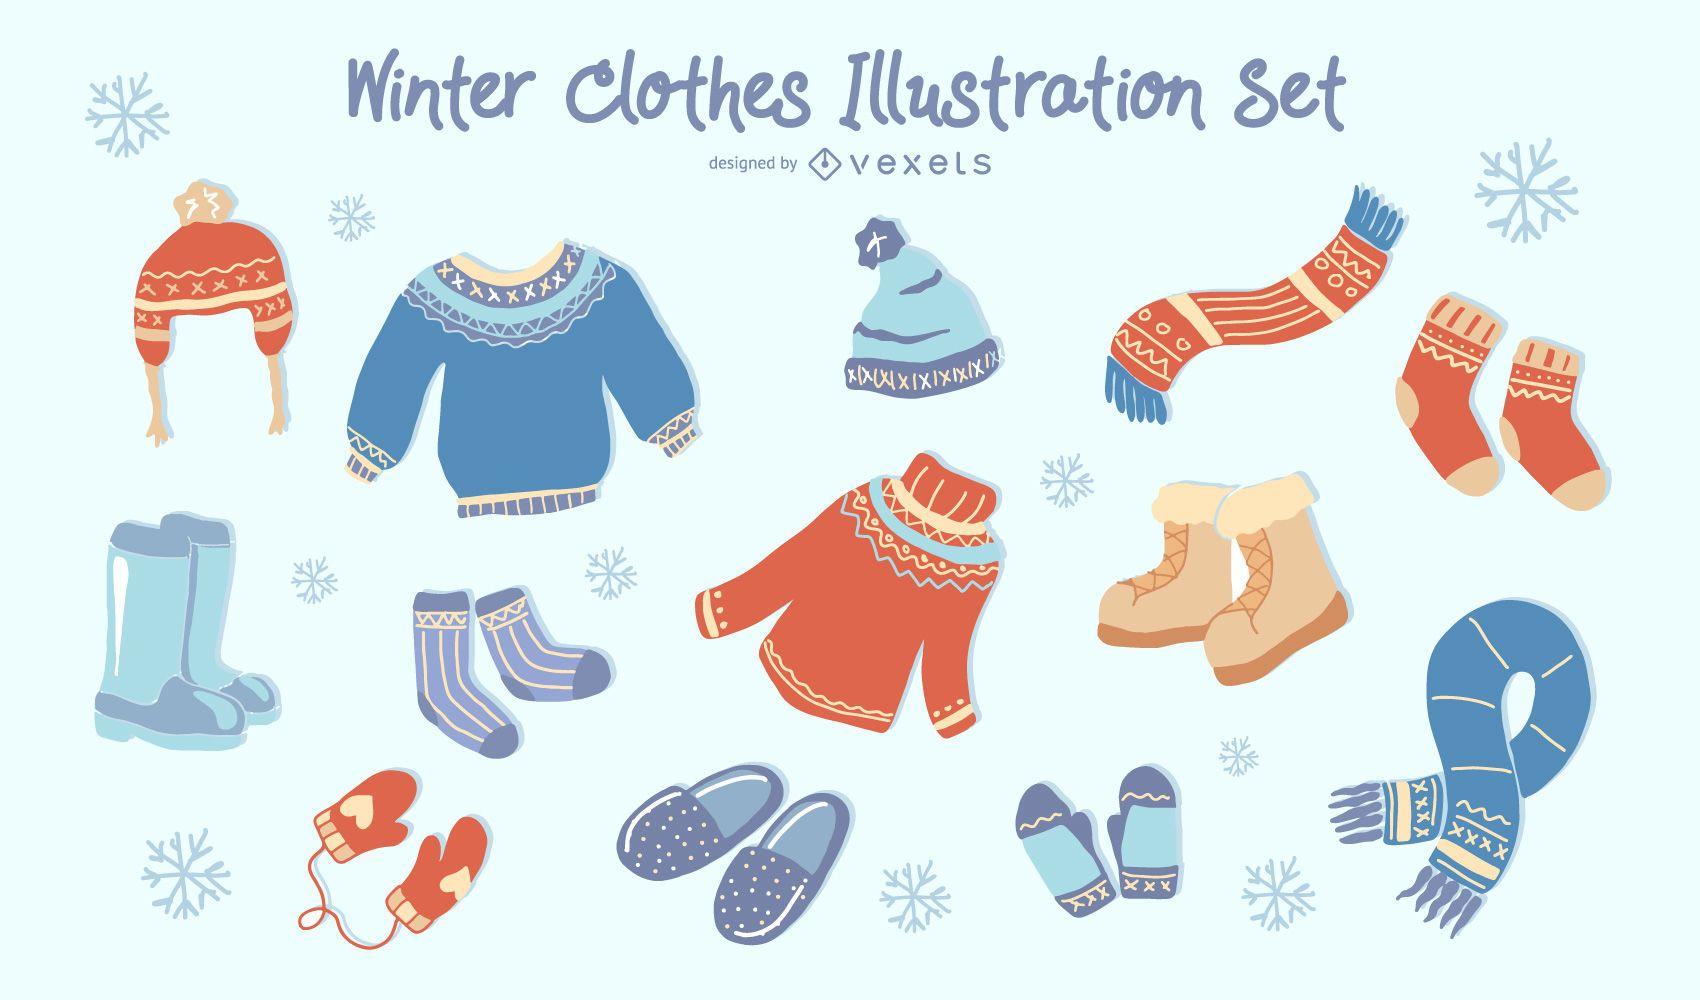 Winter clothes illustration set